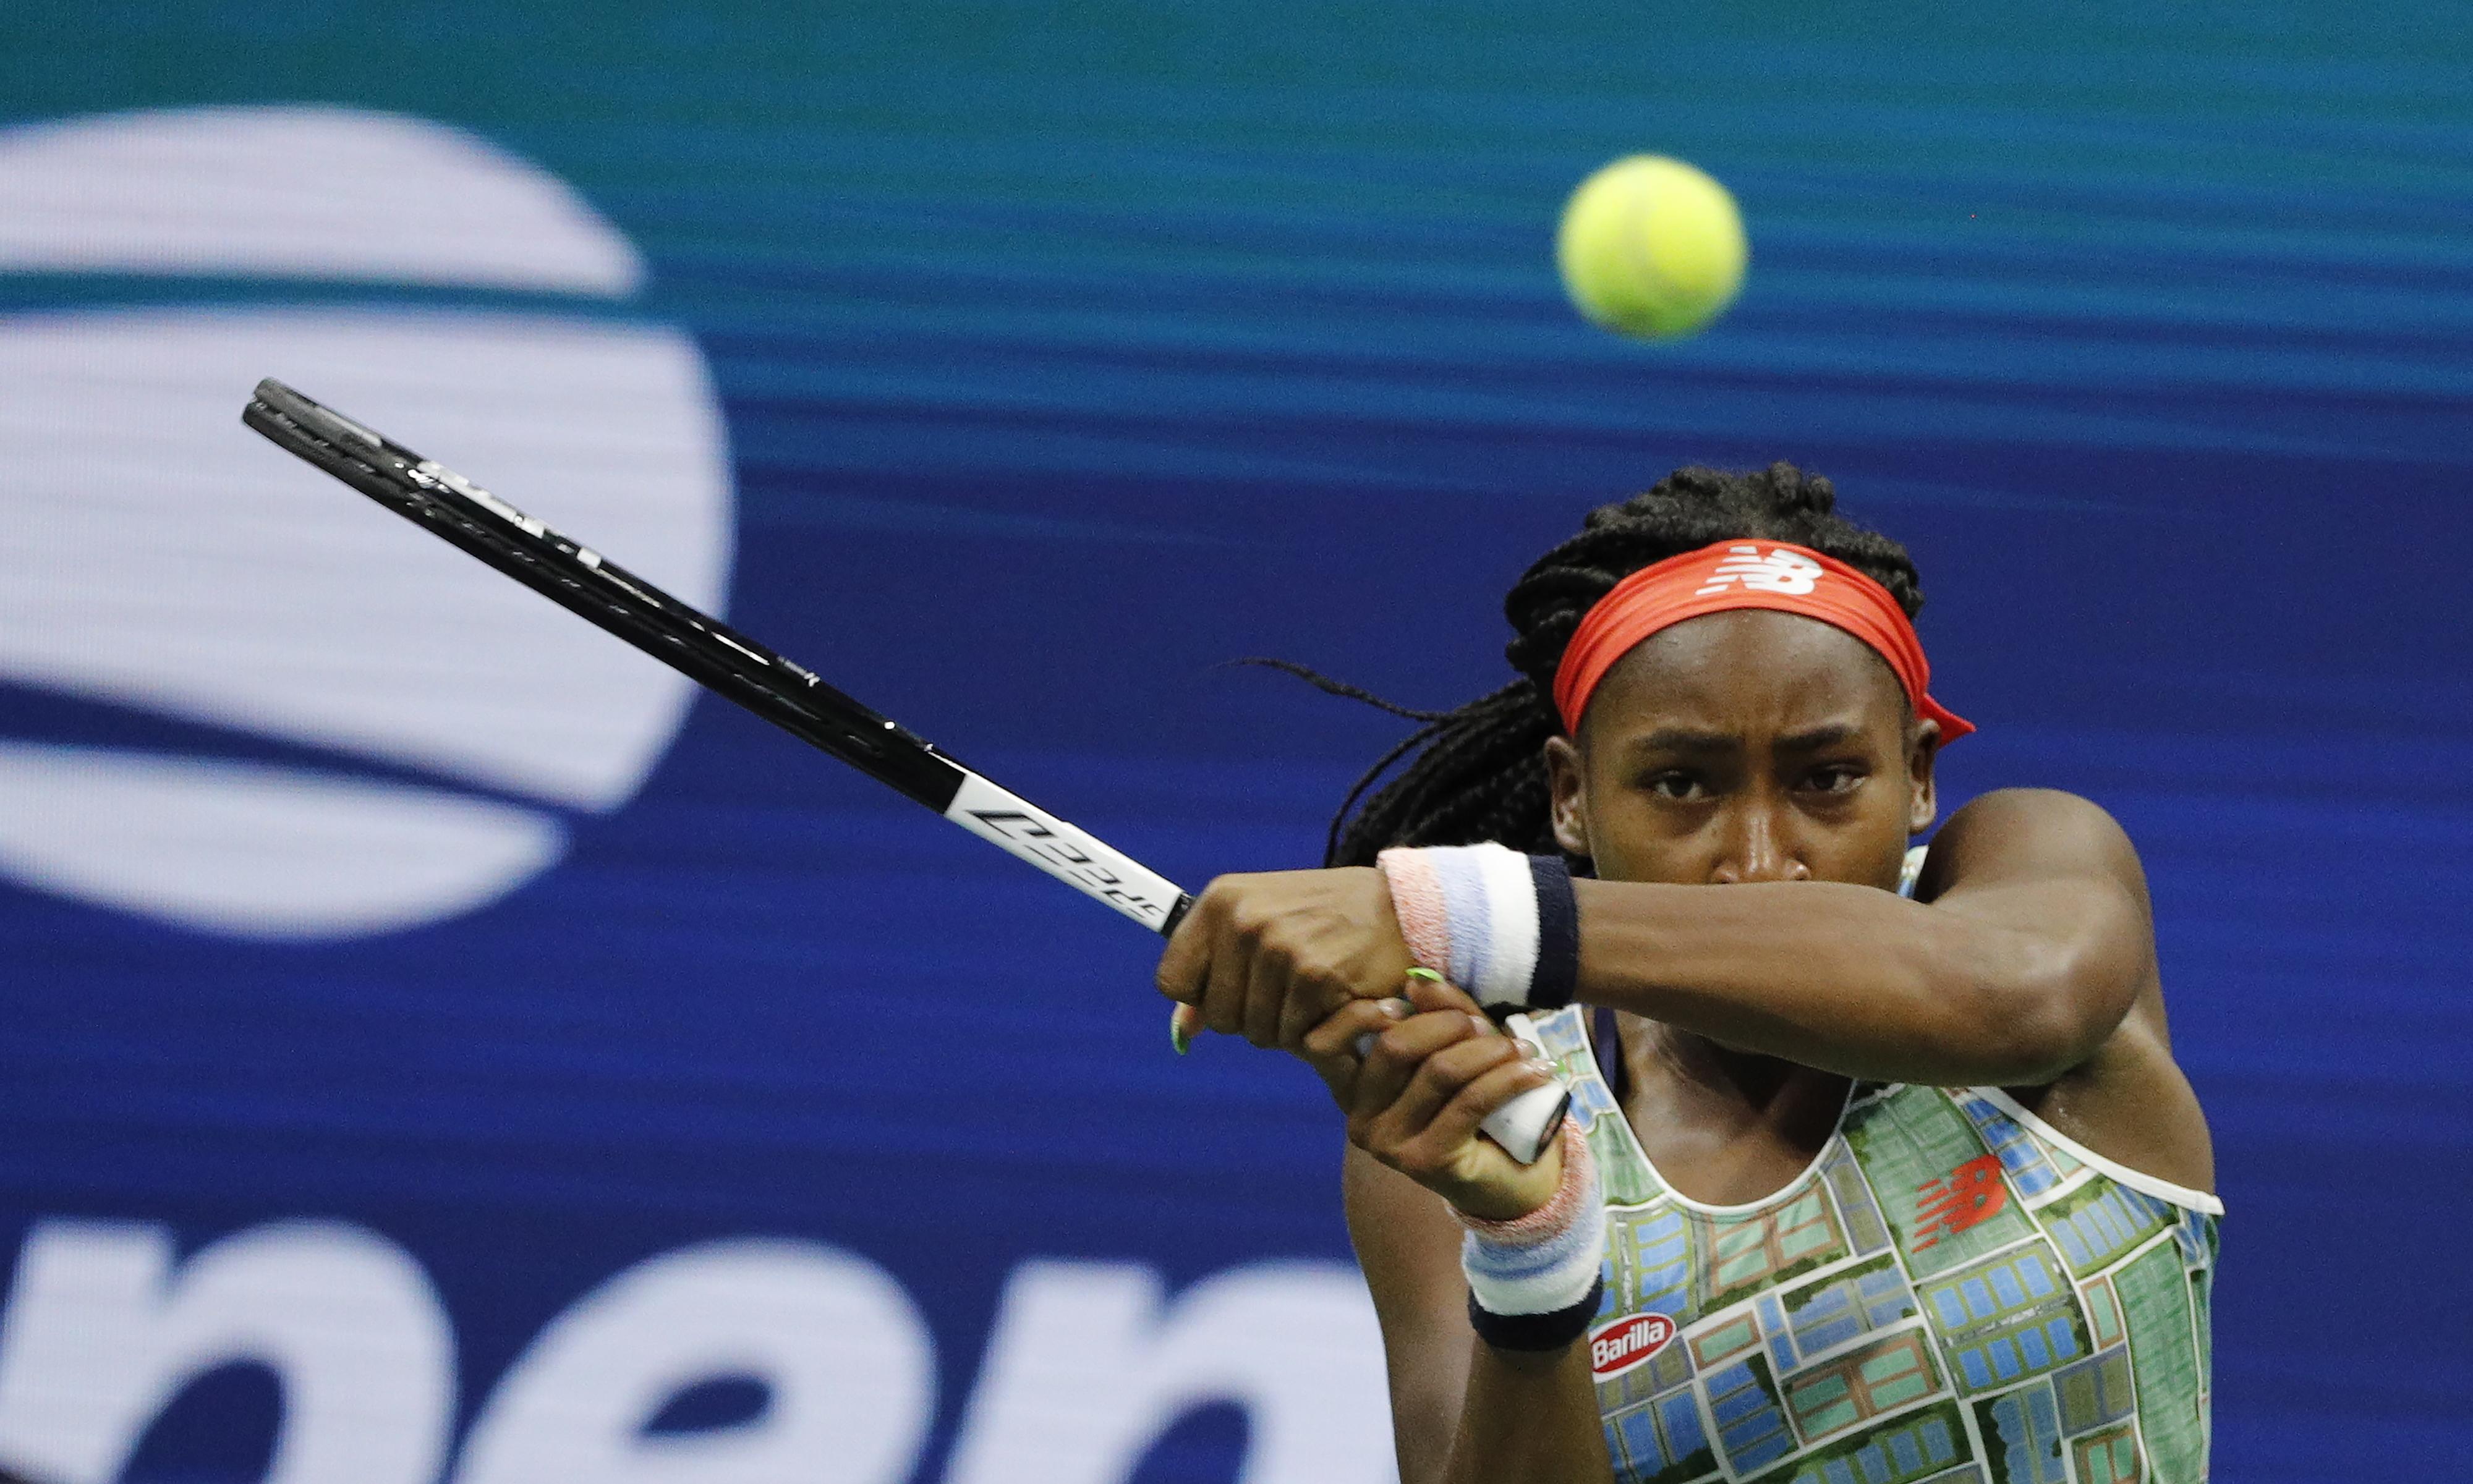 Coco Gauff vence primeiro torneio WTA aos 15 anos